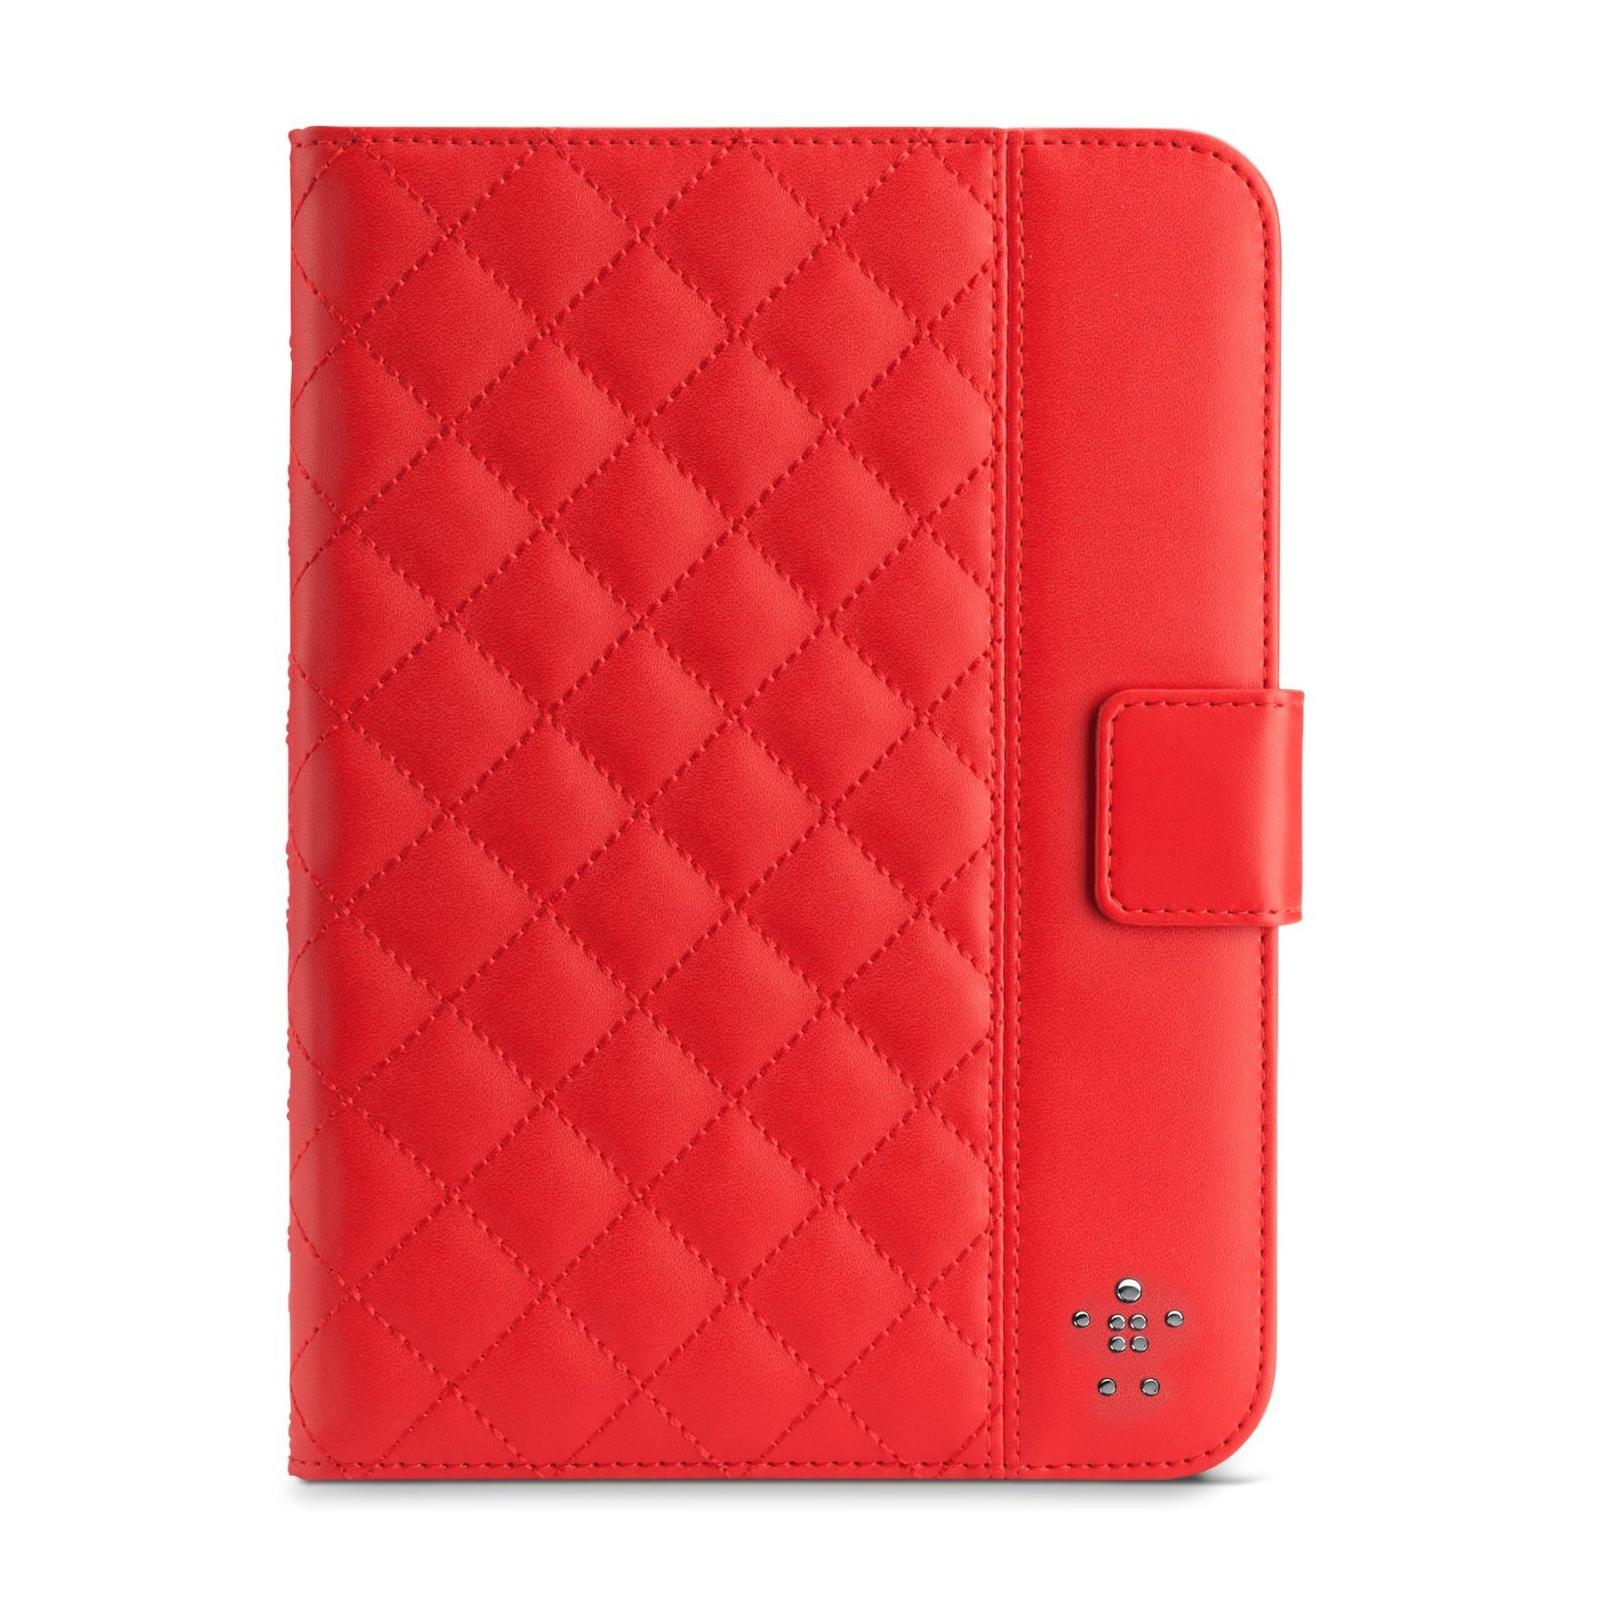 Чехол для планшета Belkin iPad Air Quilted Cover /Ruby (F7N073B2C02)